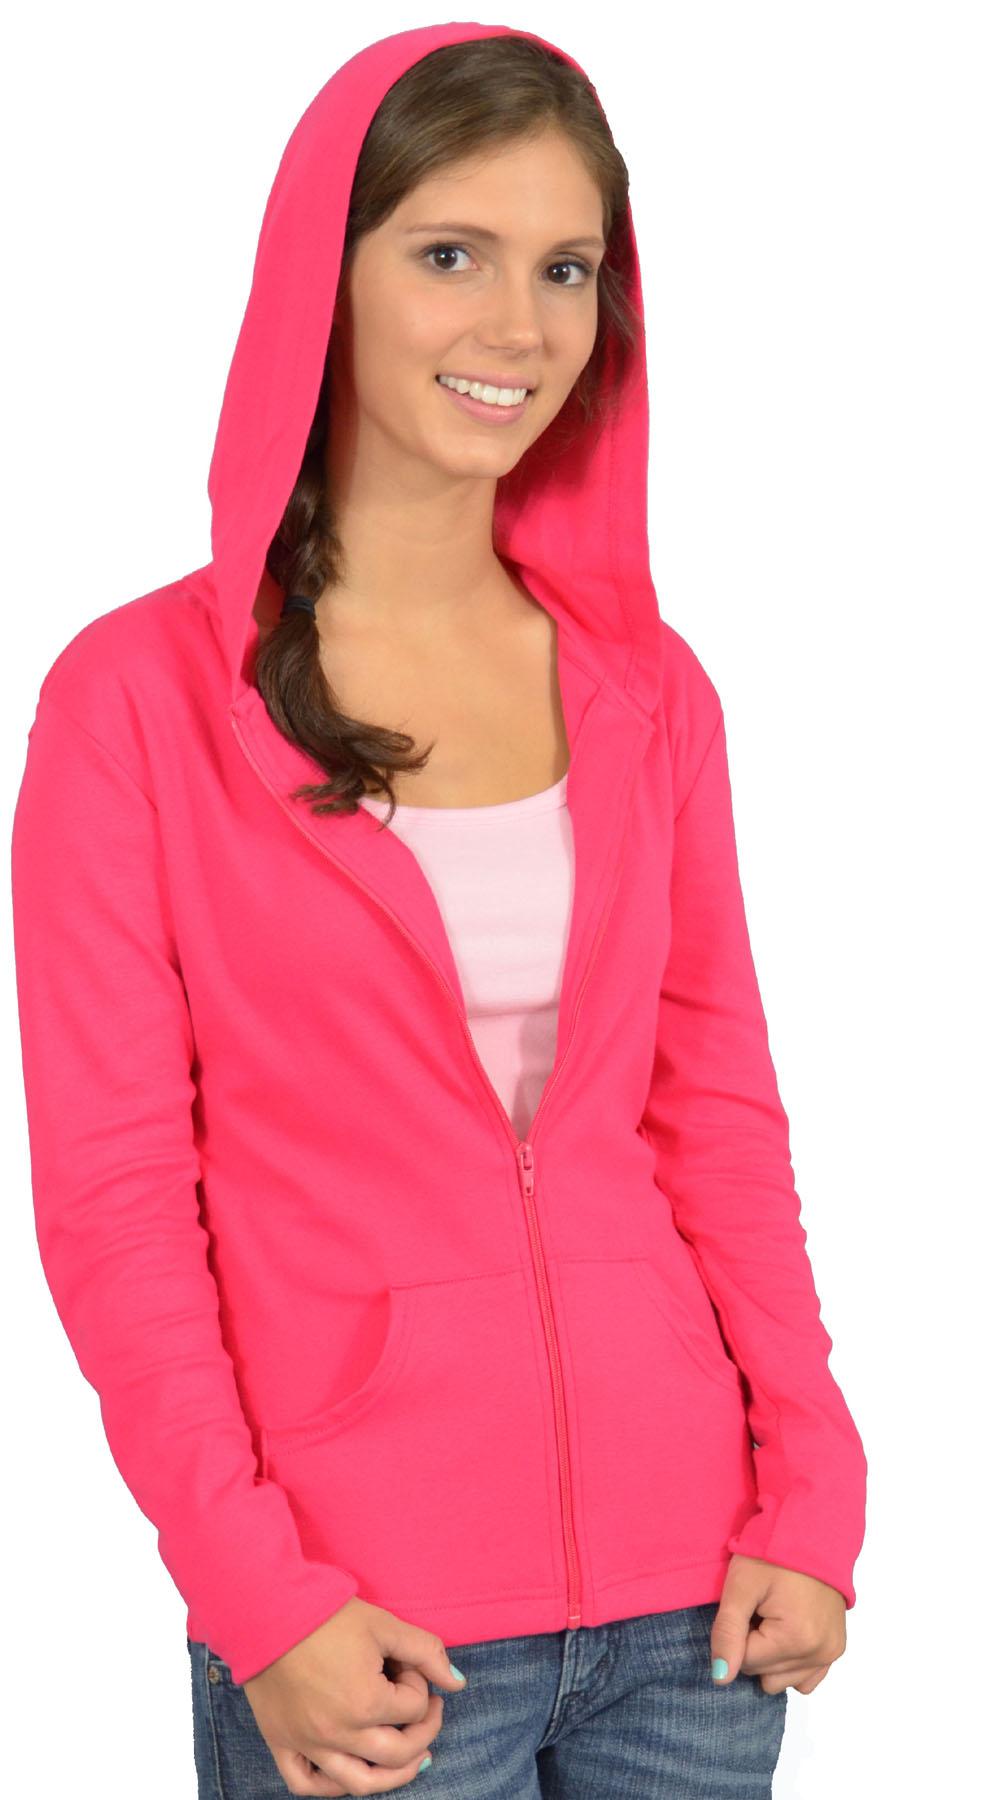 Monag 562300 - Baby Rib Hooded Jacket